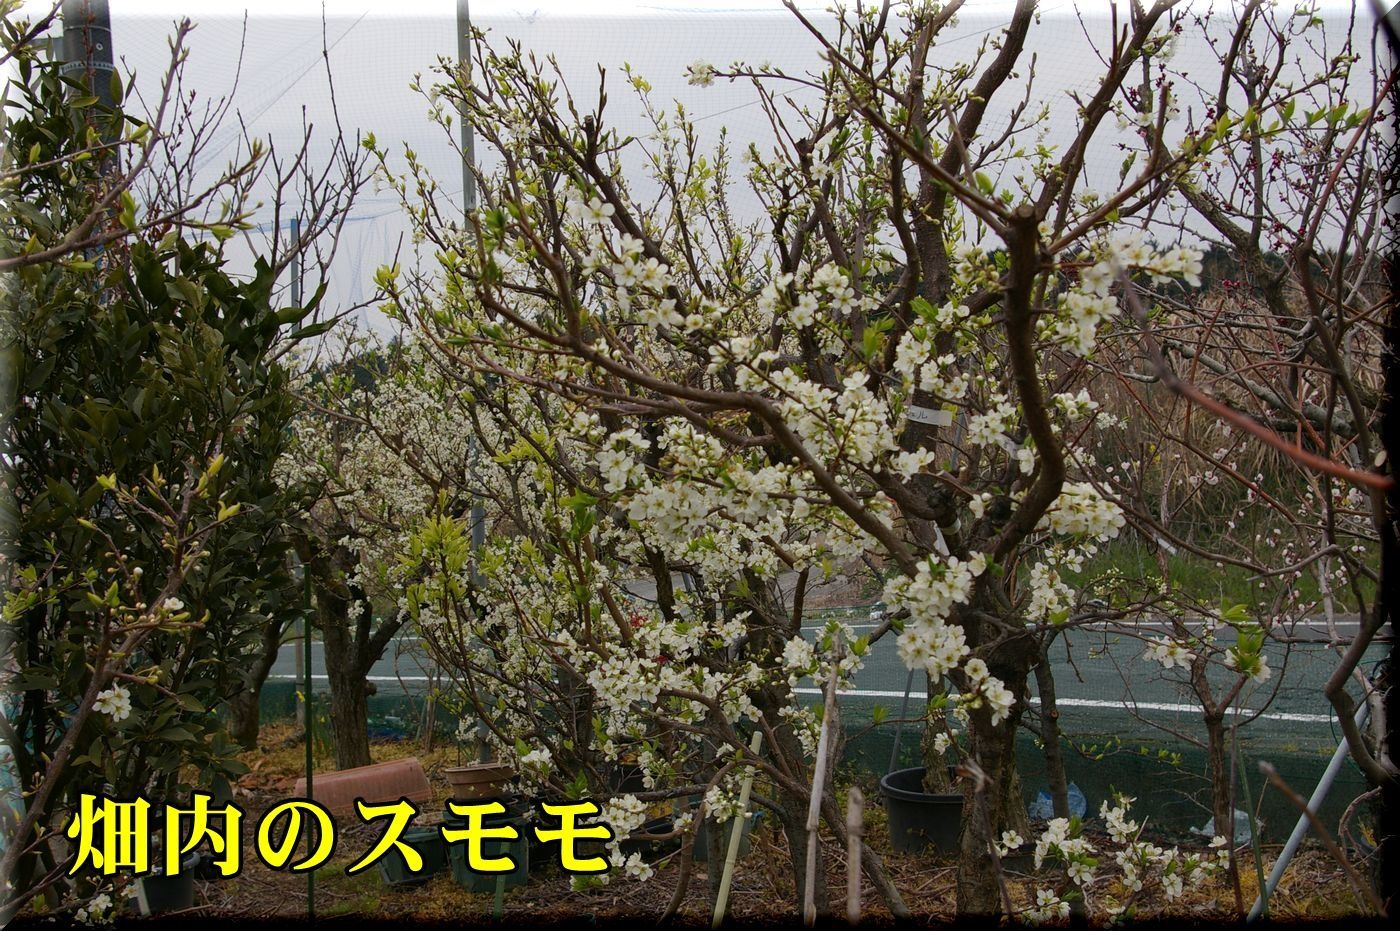 1sumomo170331_003.jpg